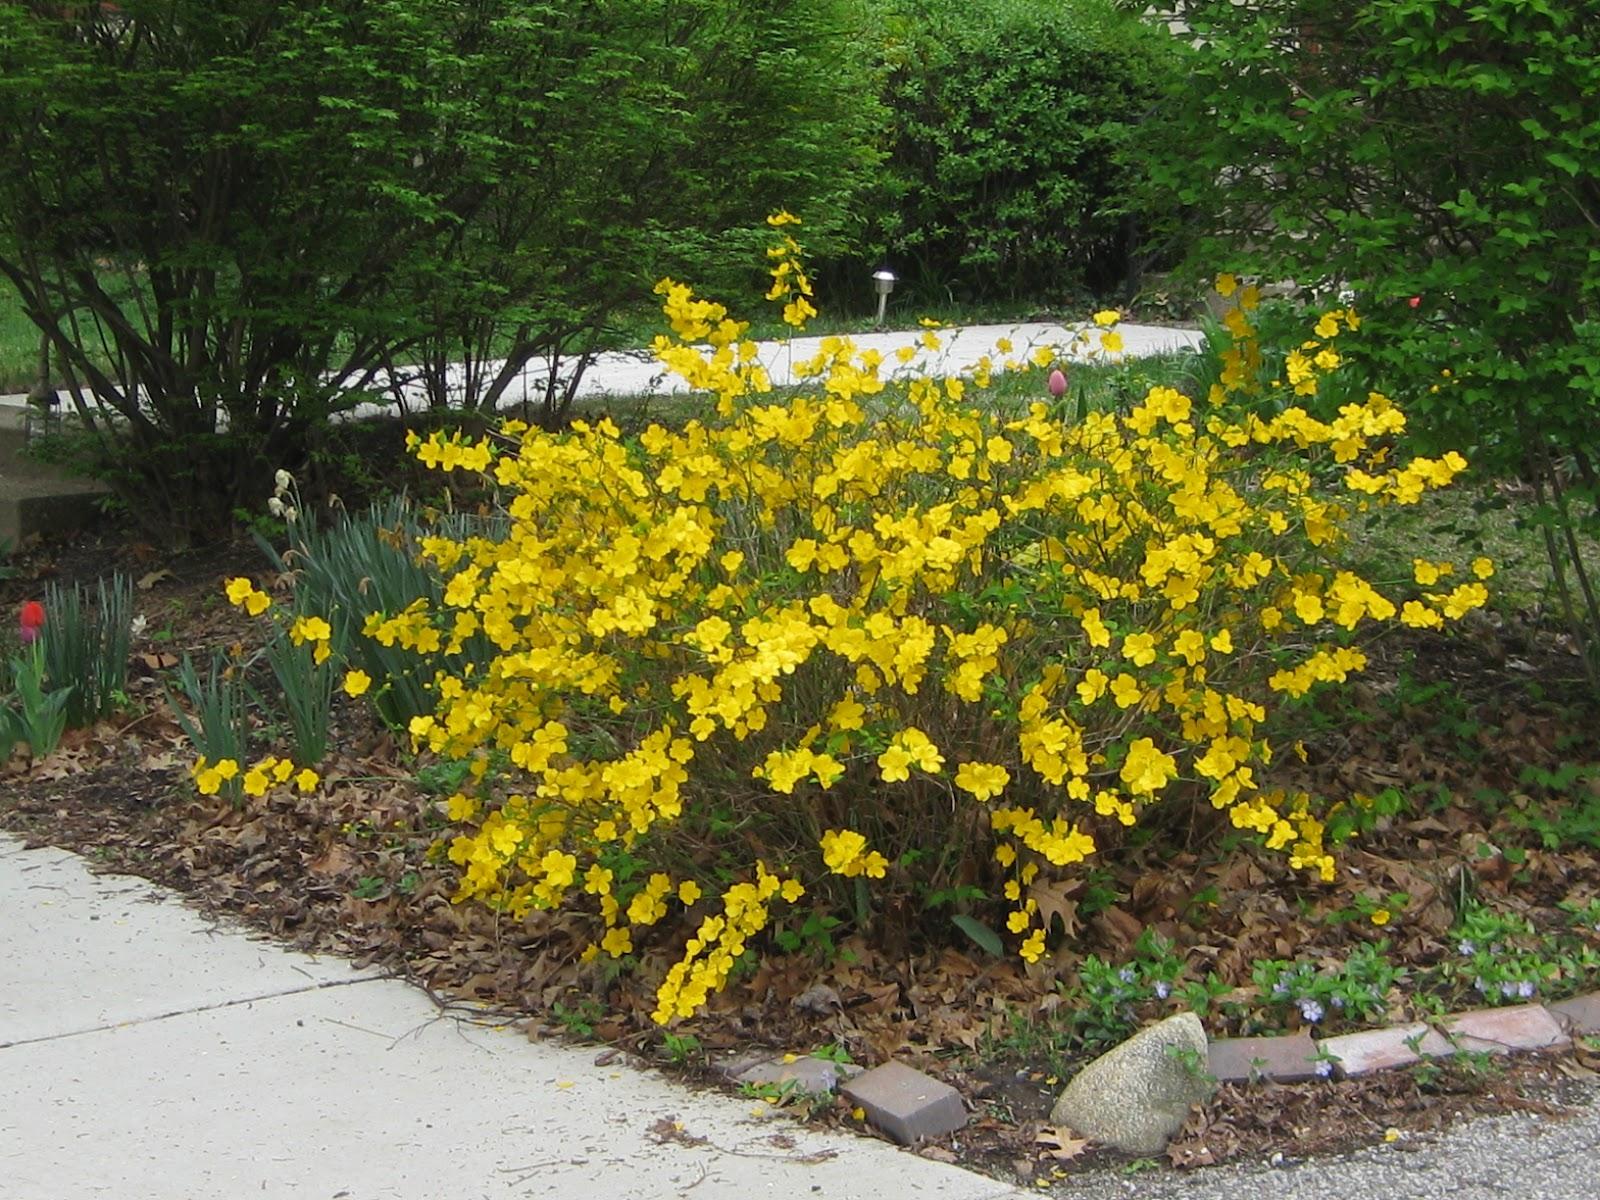 Preferred Hunkey Dorey Land: Flowering bush, zentangle, quote FU47